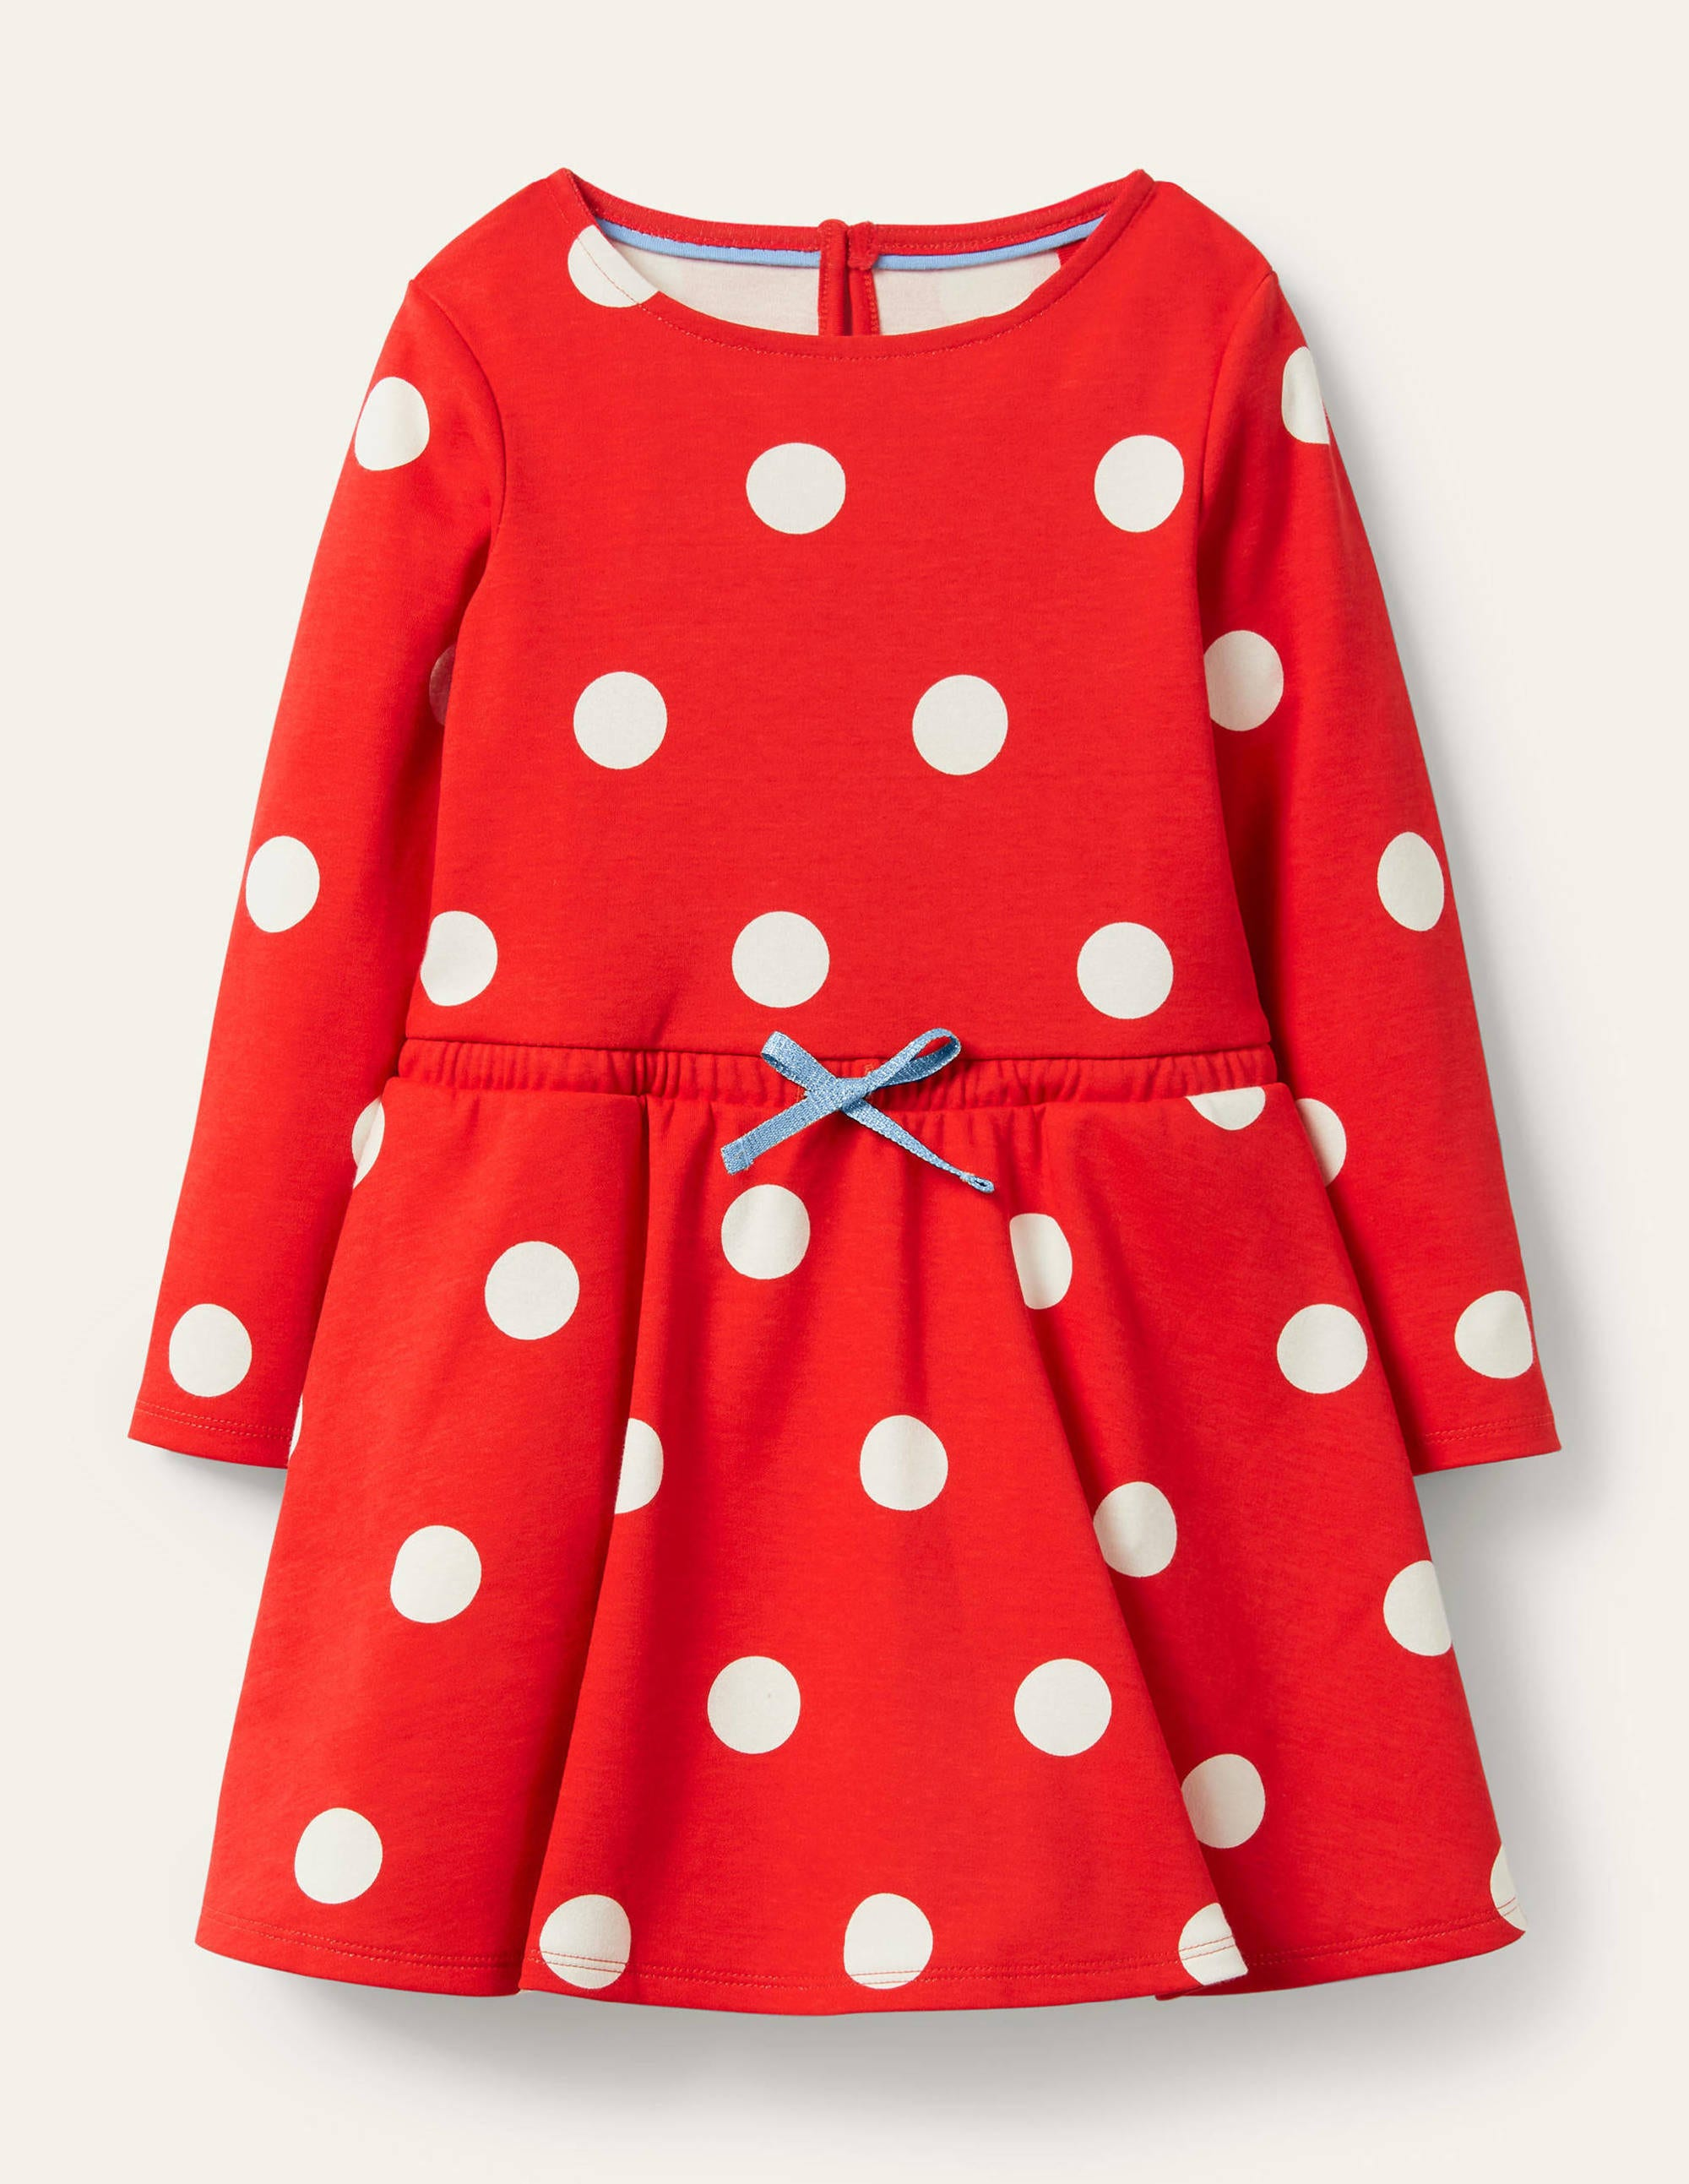 Boden Spotty Skater Dress - Fire Red Spot